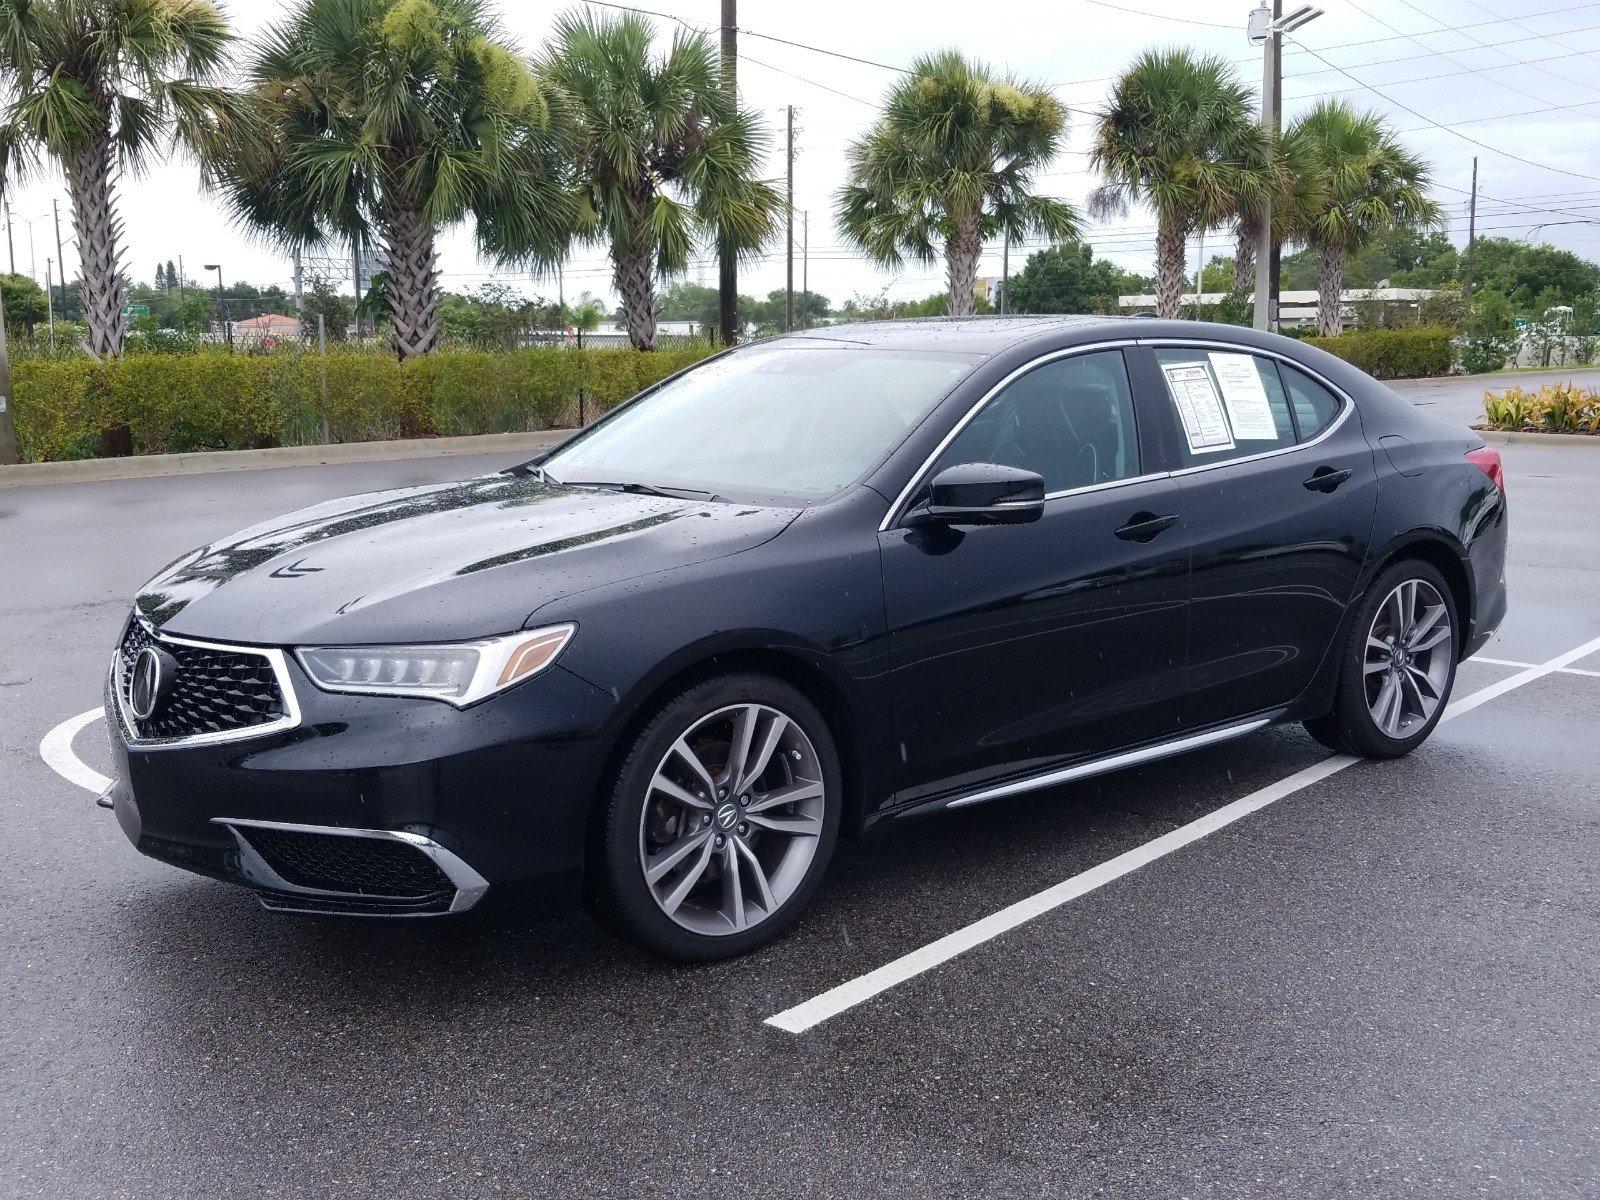 2019 Acura TLX w/Technology Pkg 3.5L FWD w/Technology Pkg